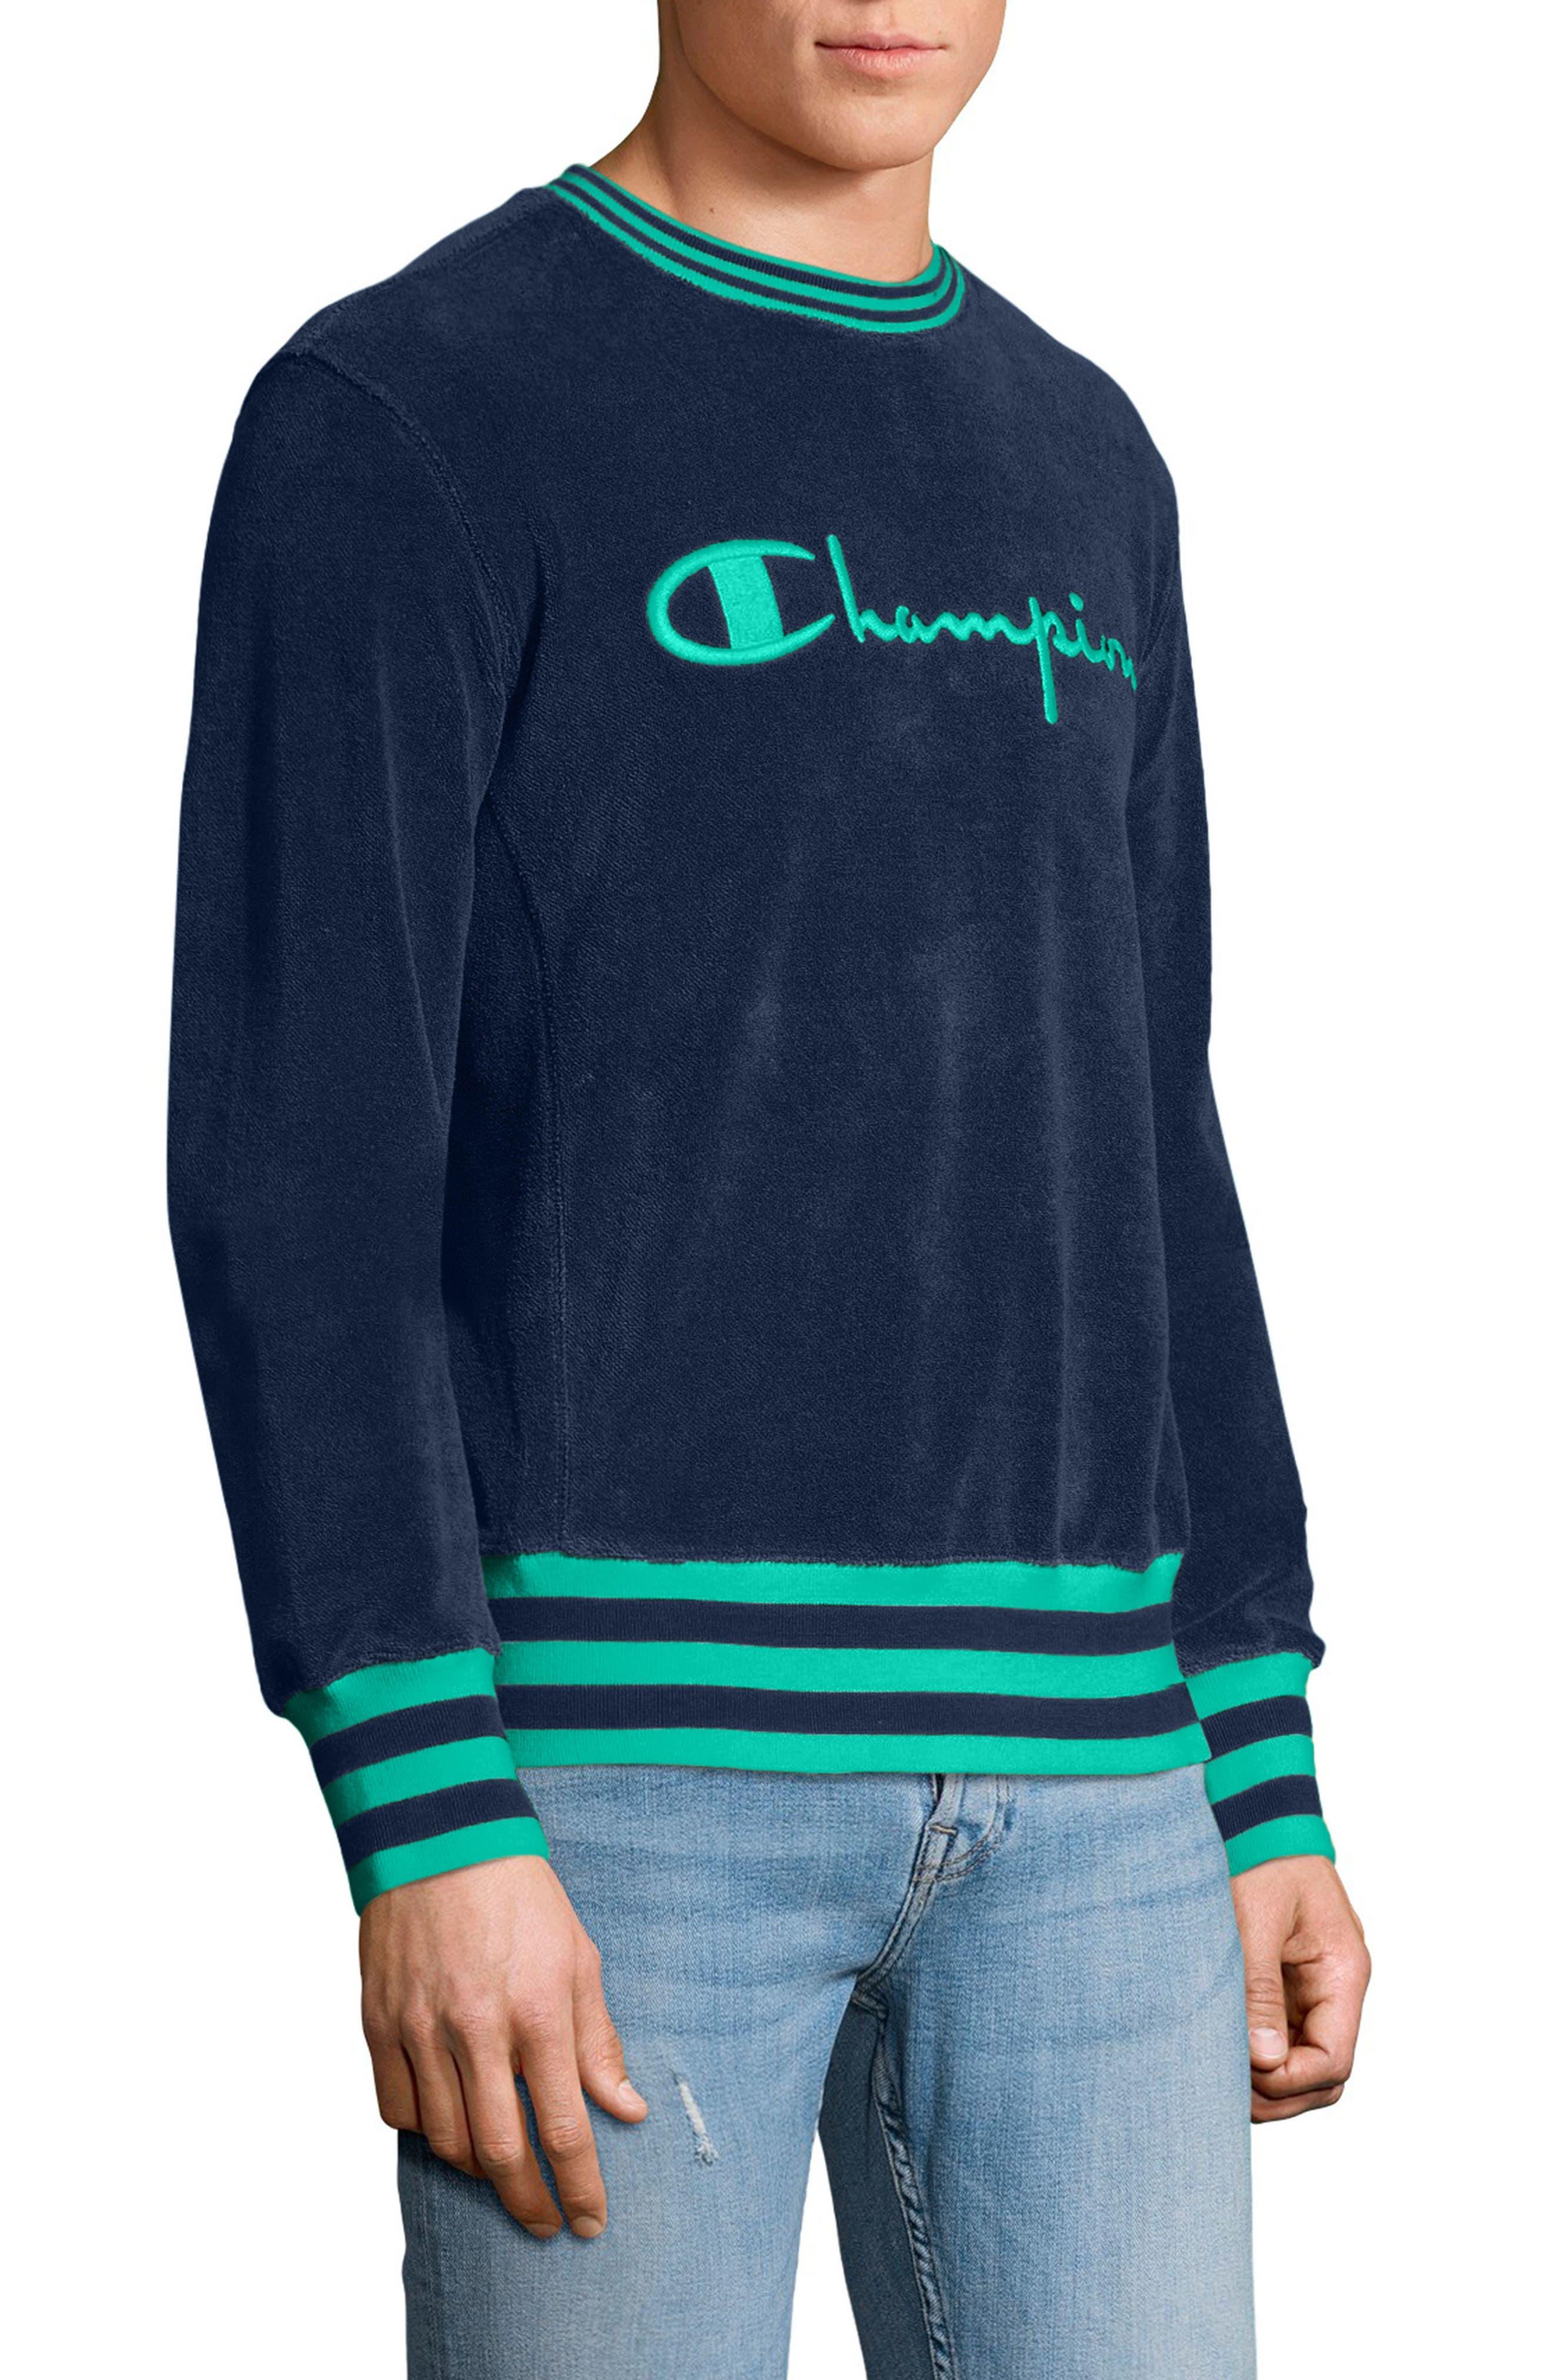 Sponge Terry Crewneck Sweatshirt,                             Alternate thumbnail 3, color,                             Navy